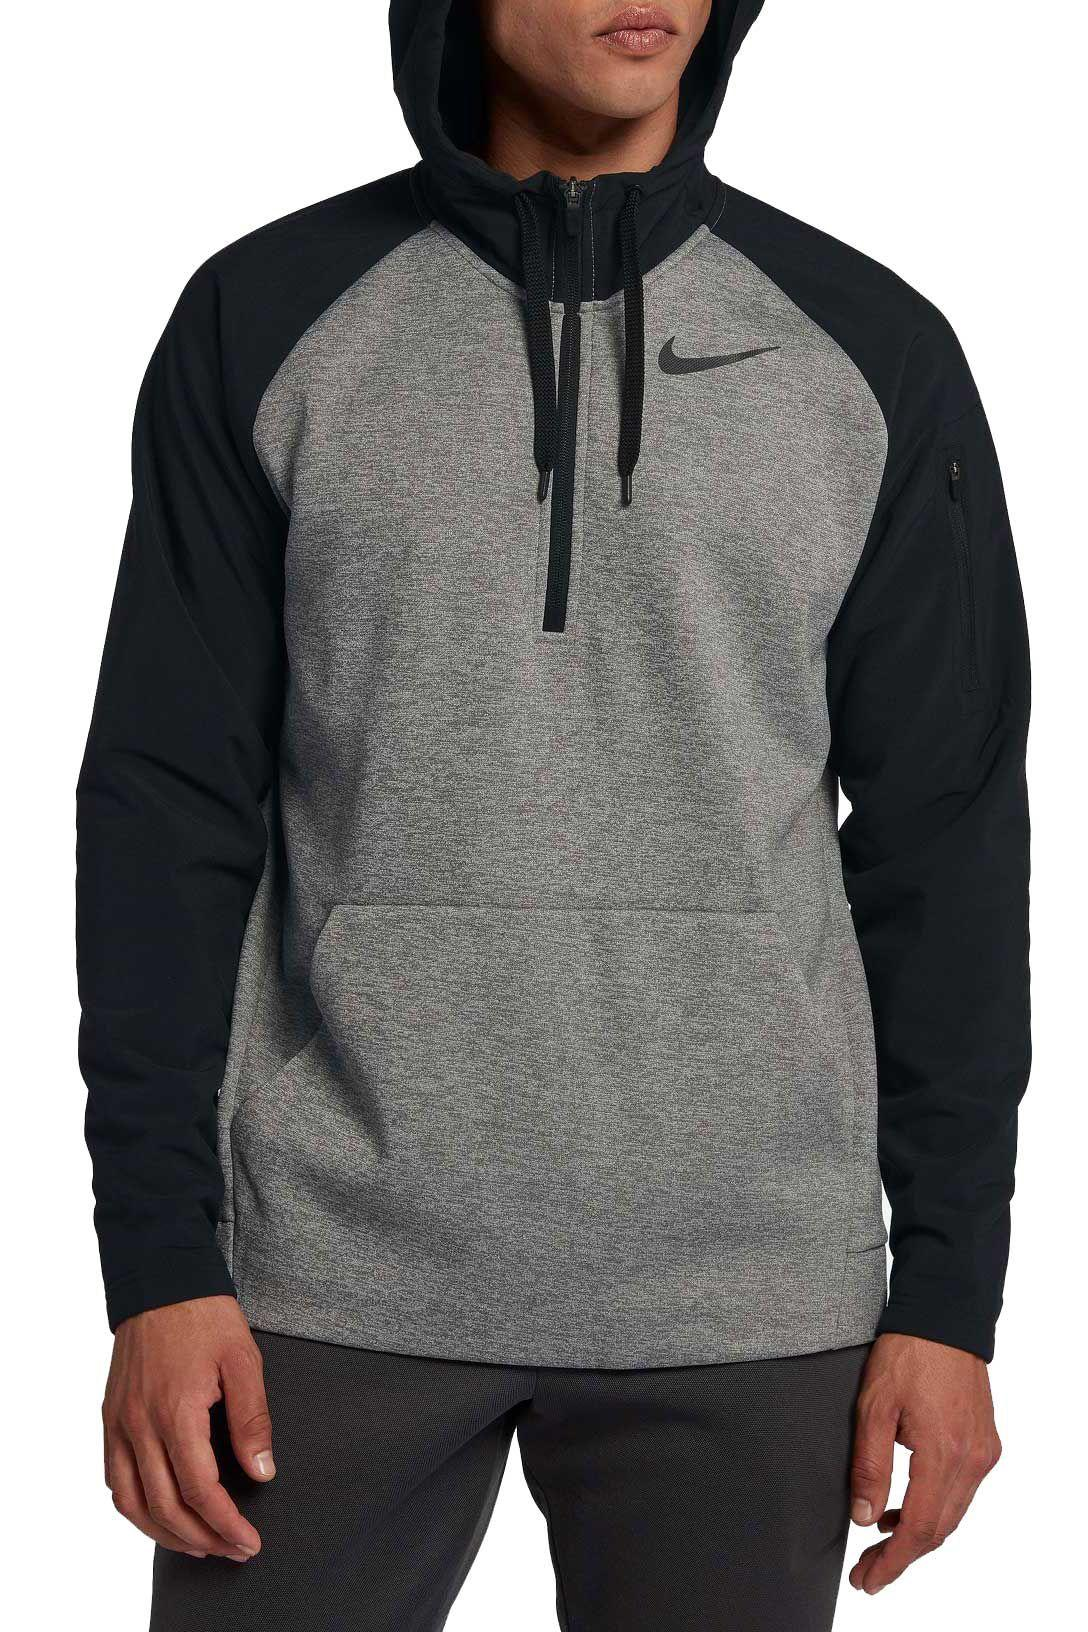 723381debf9 Lyst - Nike Therma Utility Fleece 1 4 Zip Pullover in Gray for Men